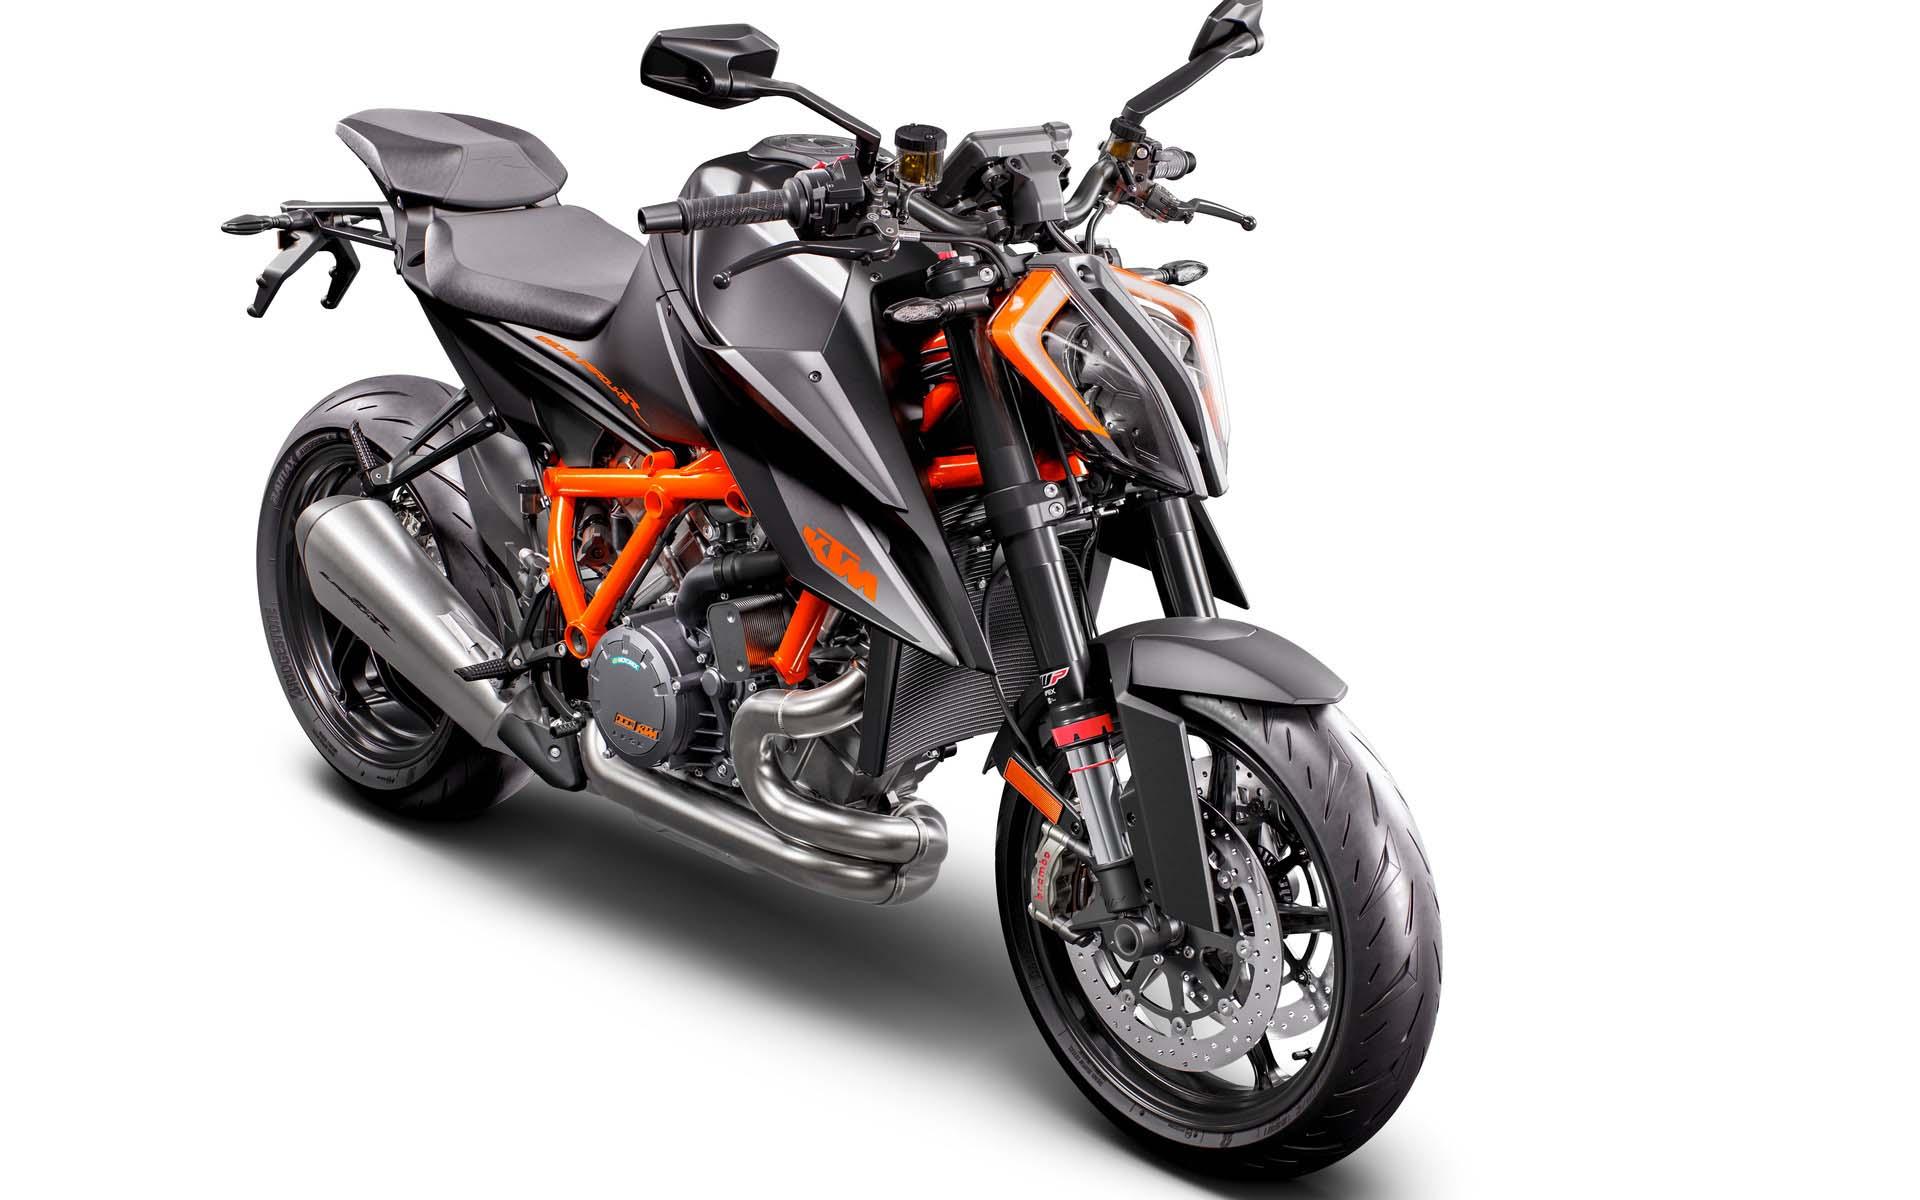 The Beast Gets Upgraded With The 2020 Ktm 1290 Super Duke R Asphalt Rubber